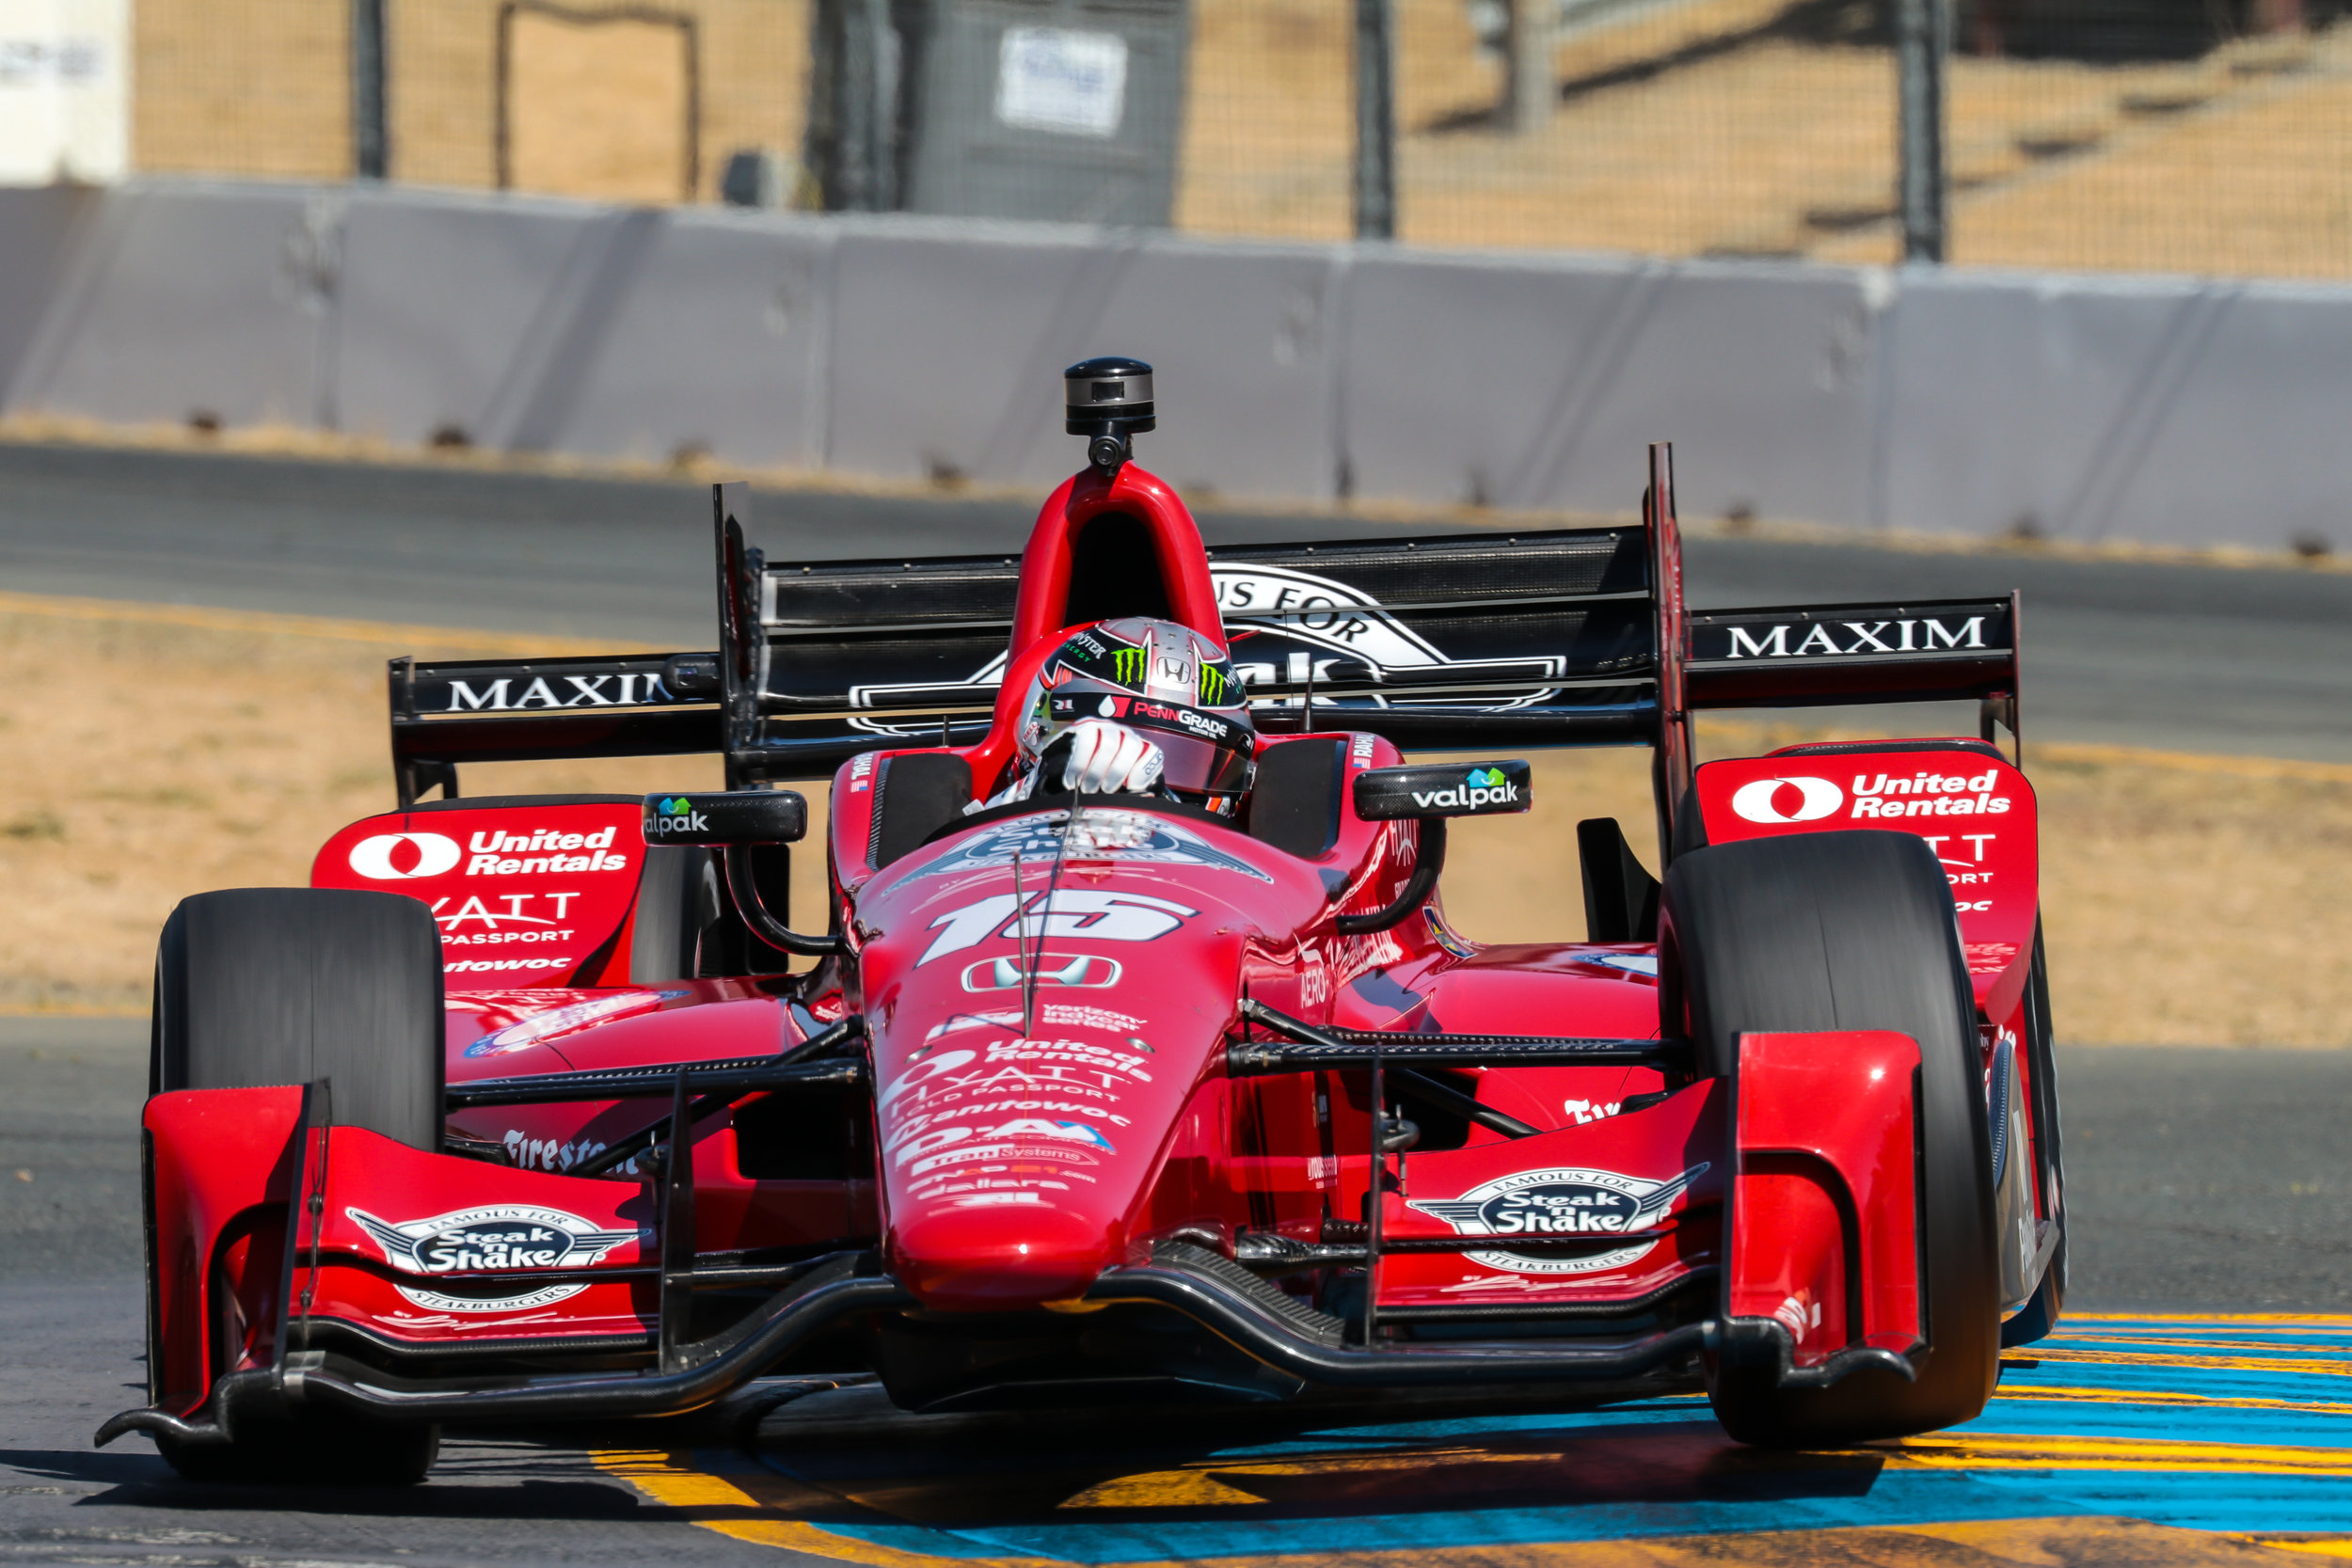 Indy16-2214.jpg